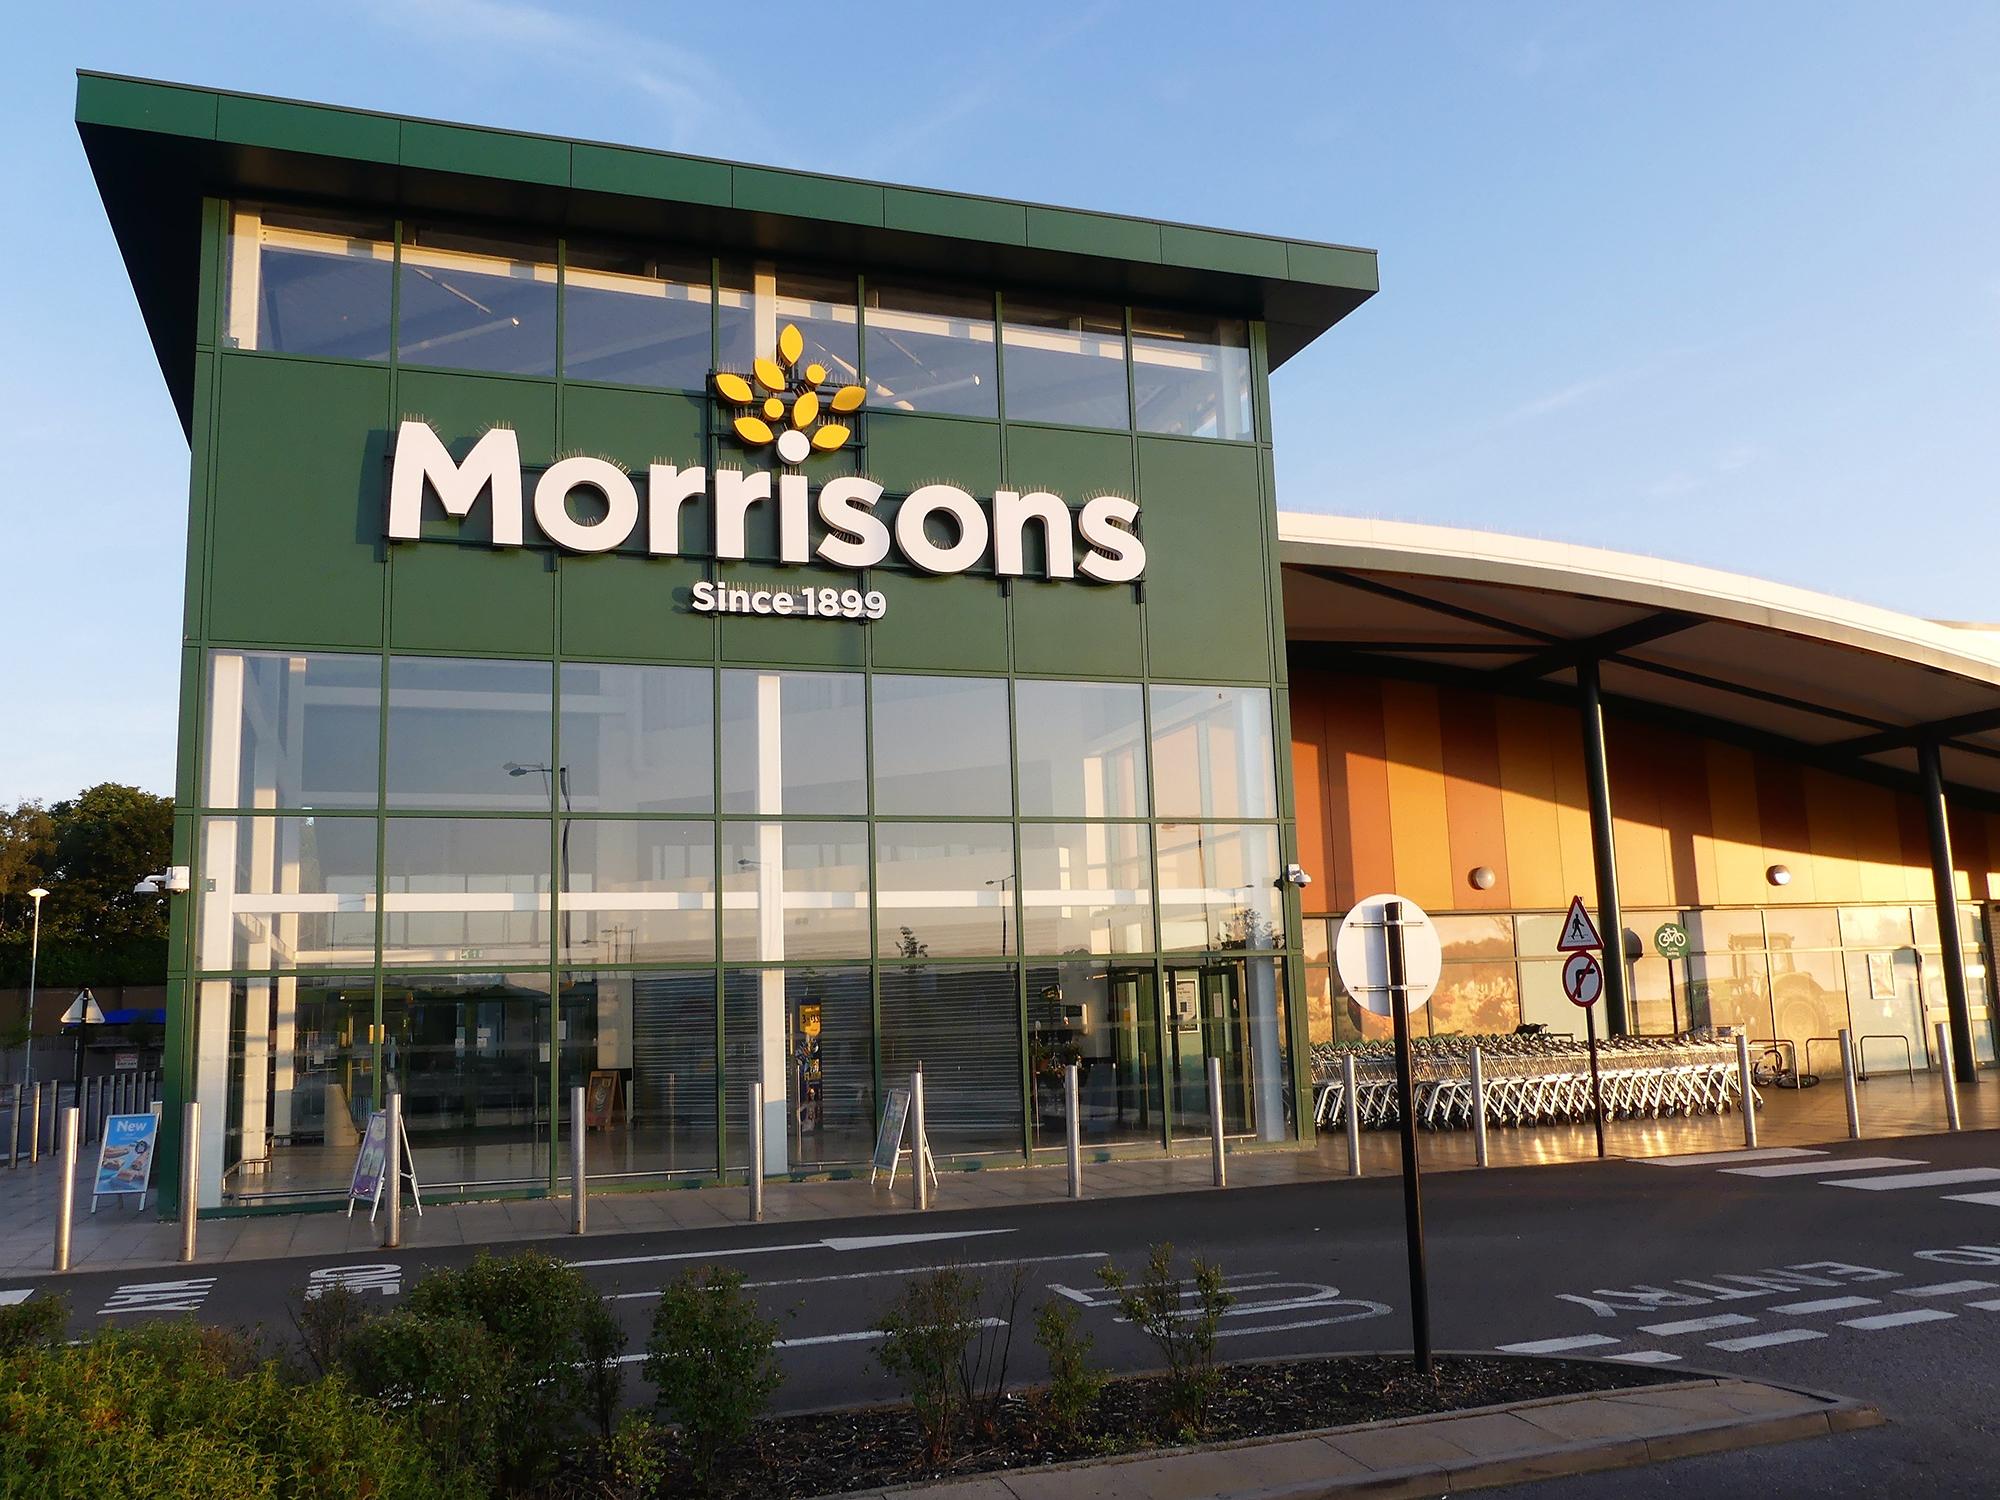 Morrisons store. (Image: Peter_Fleming/Shutterstock)